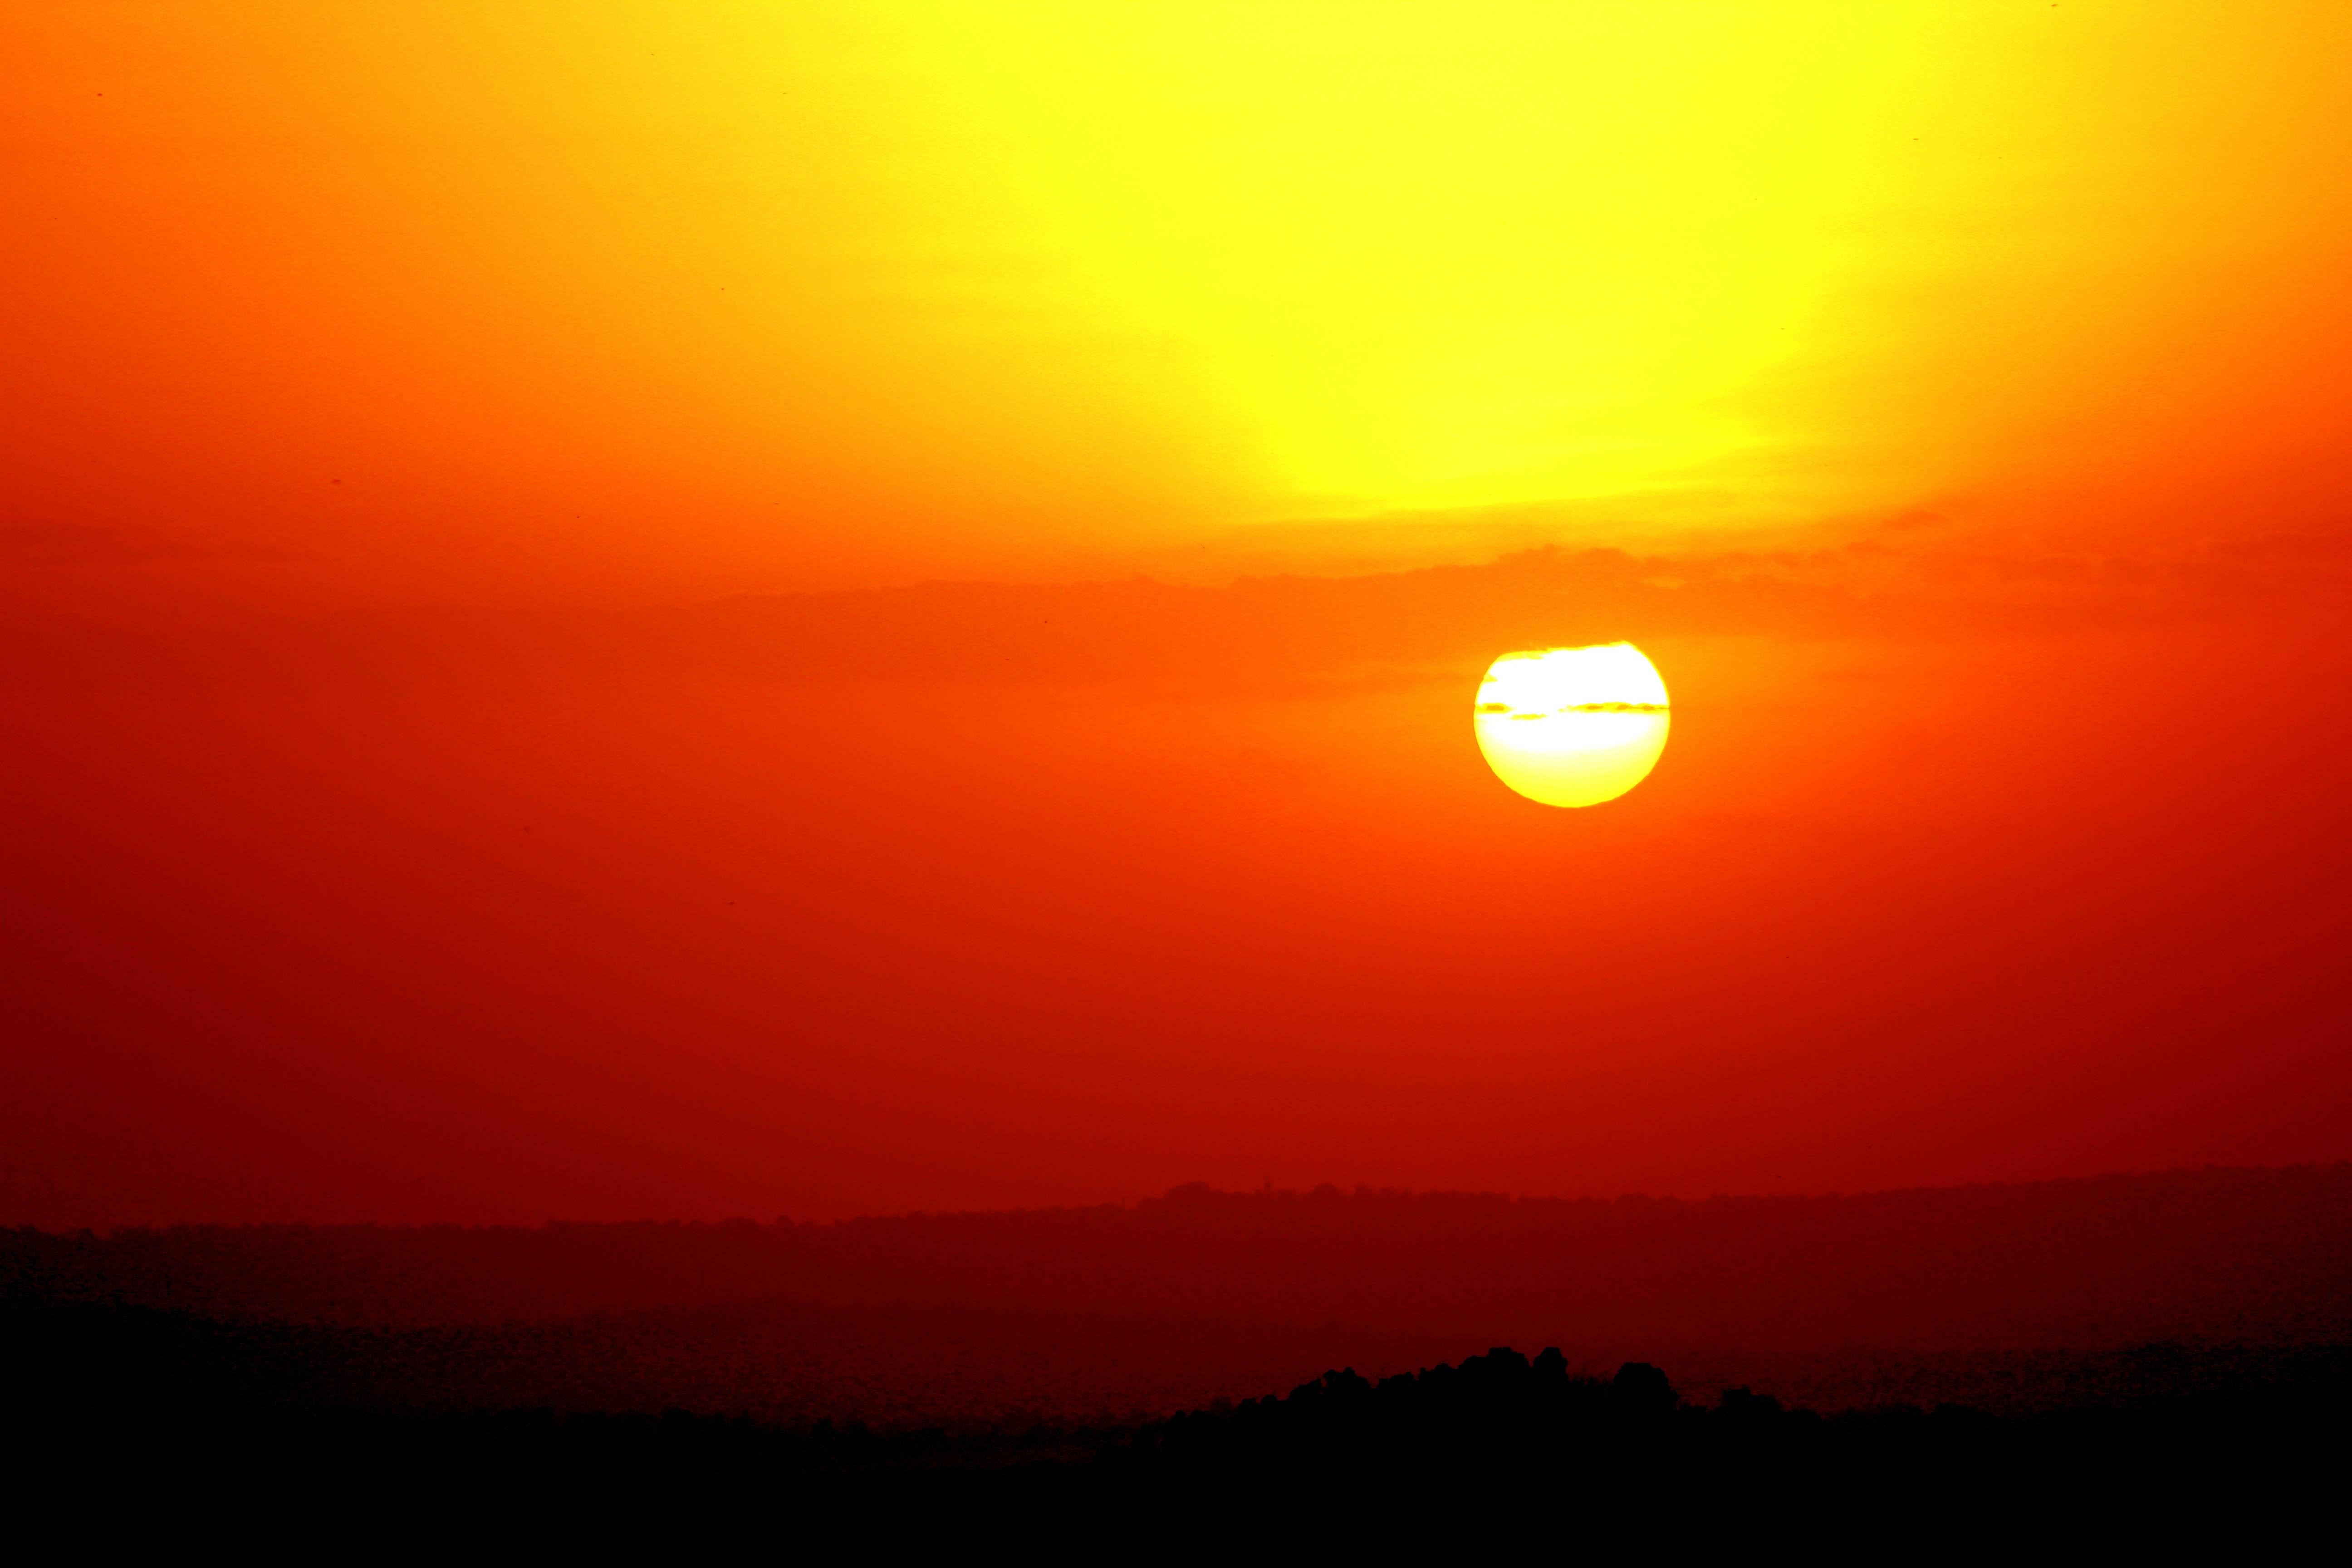 orange sun during sunset  u00b7 free stock photo